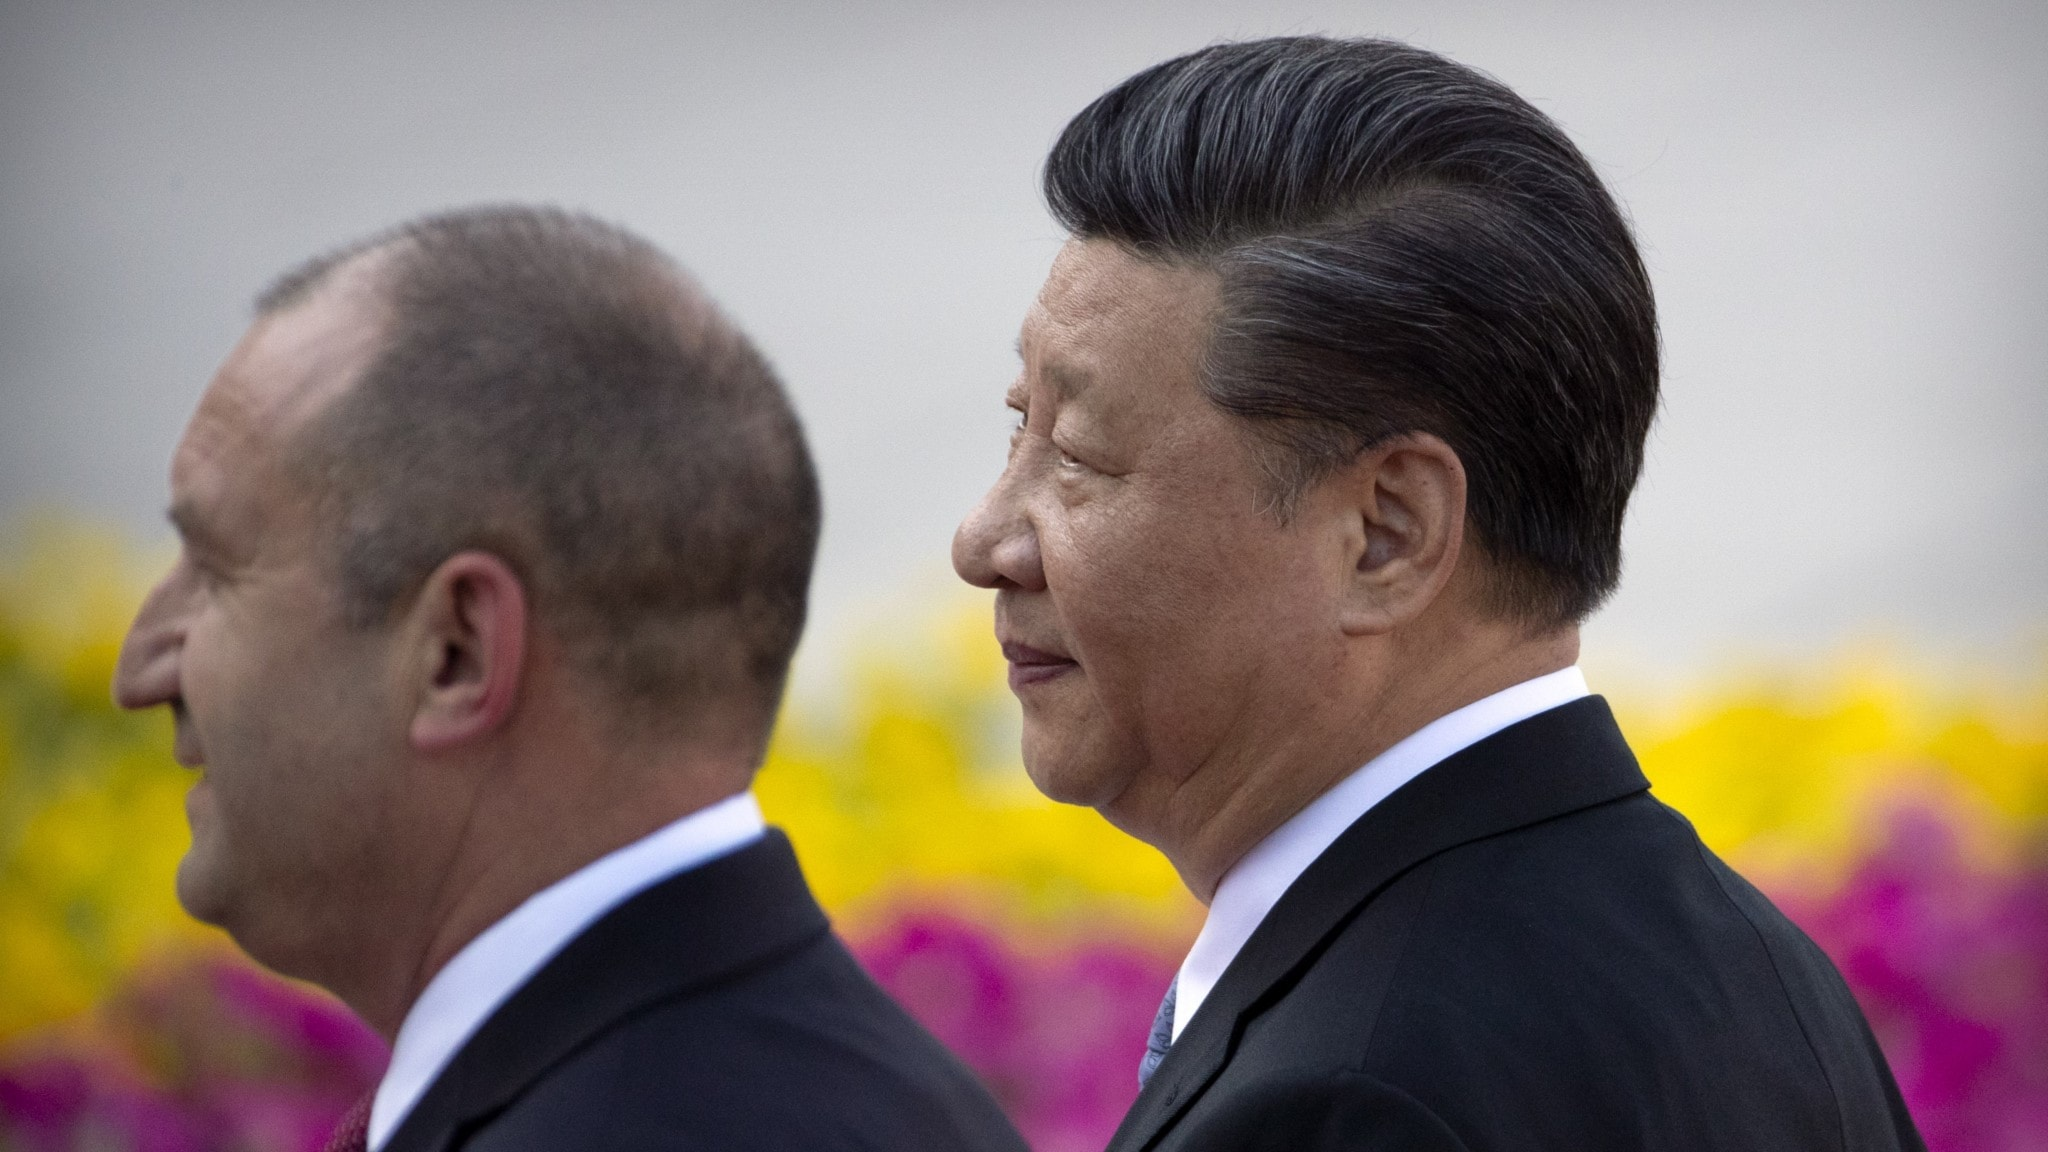 Kina matchmaking